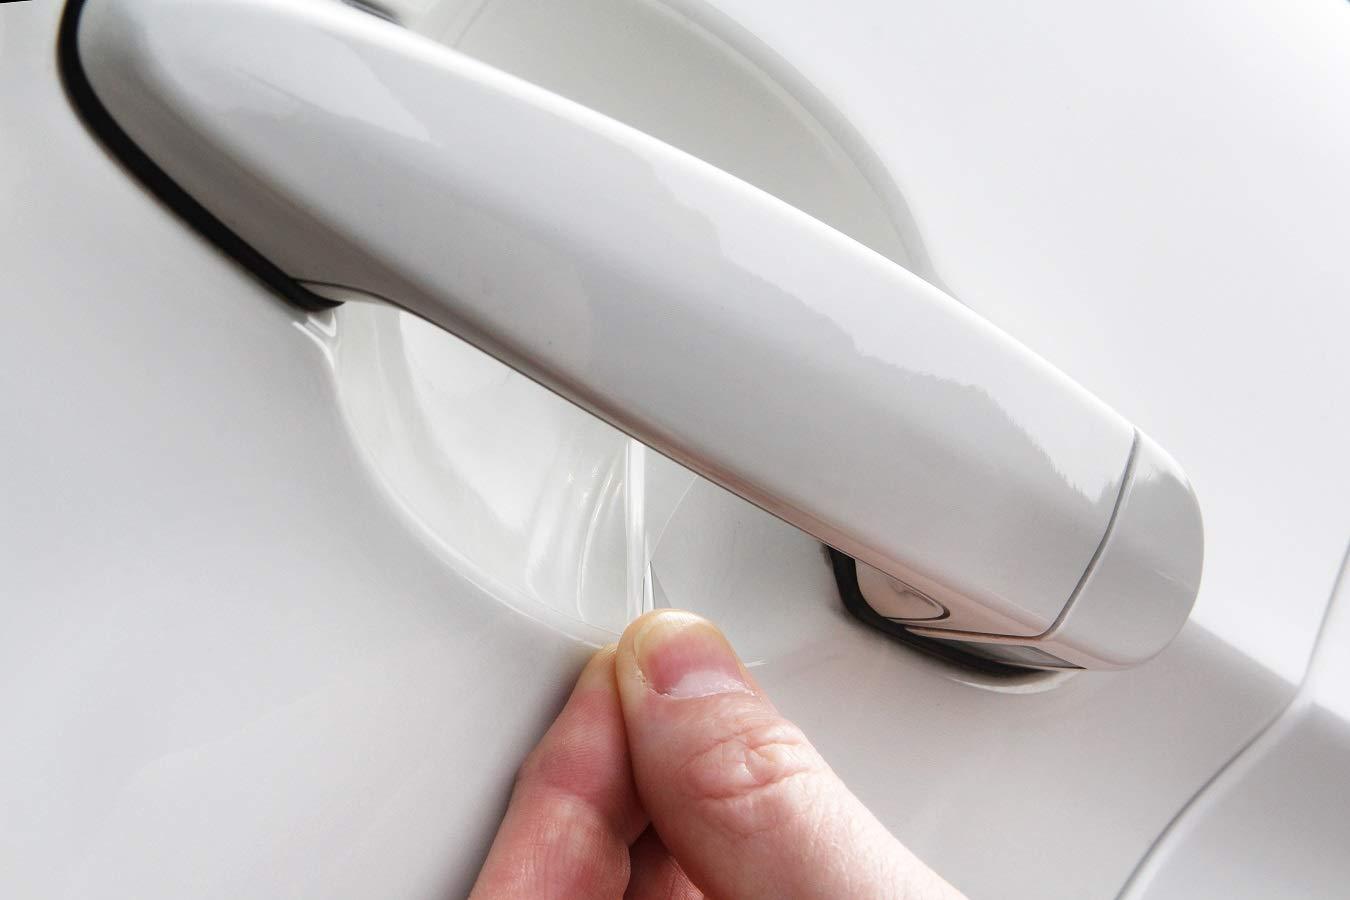 Lamin-x N1552 Door Handle Cup Paint Protection